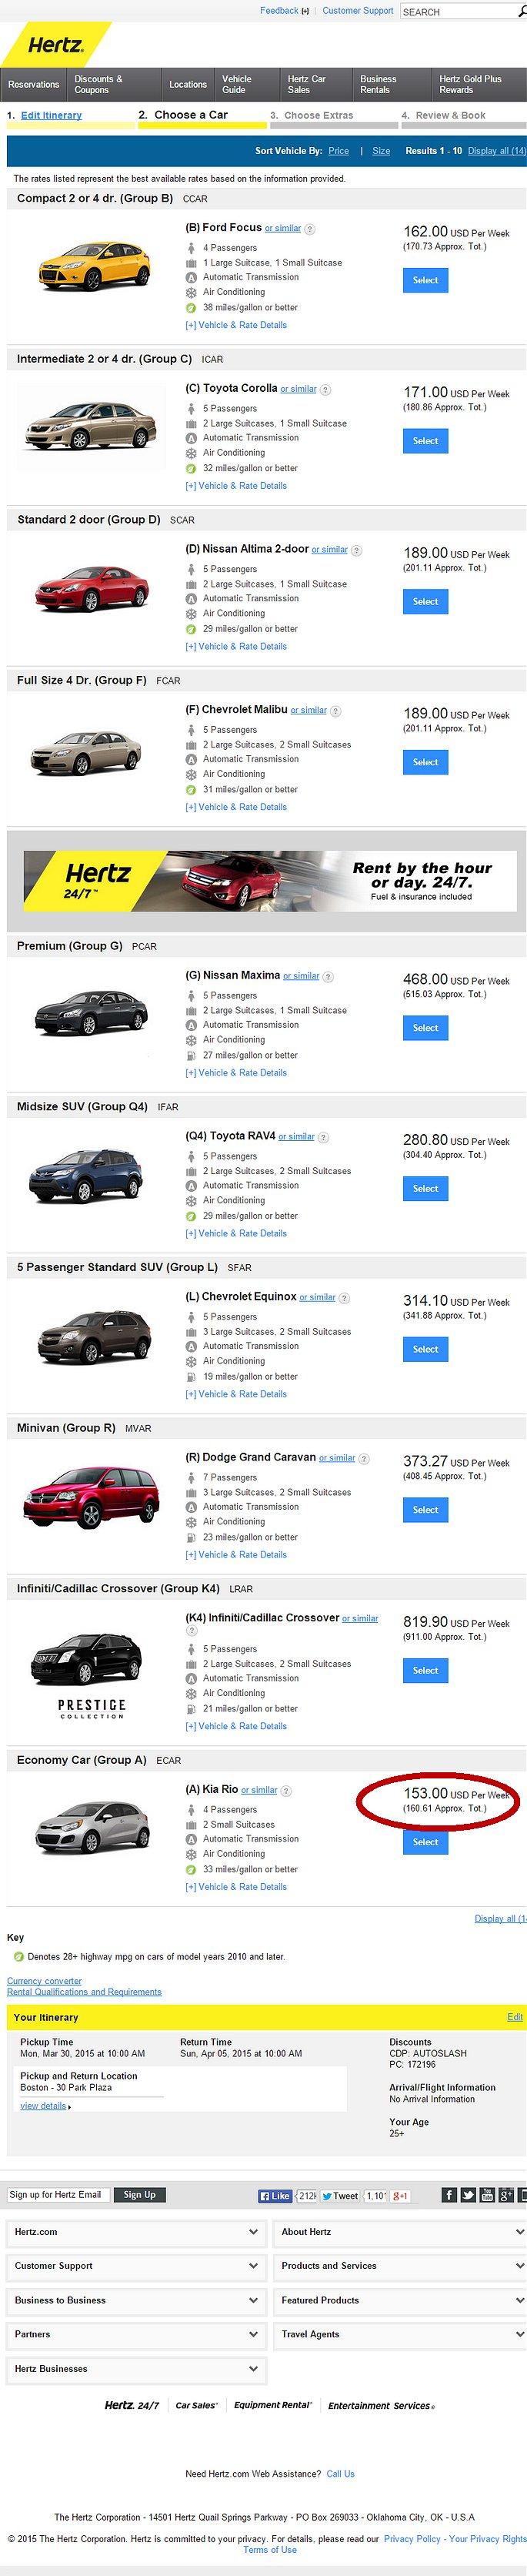 Car Rental List Hertz Price